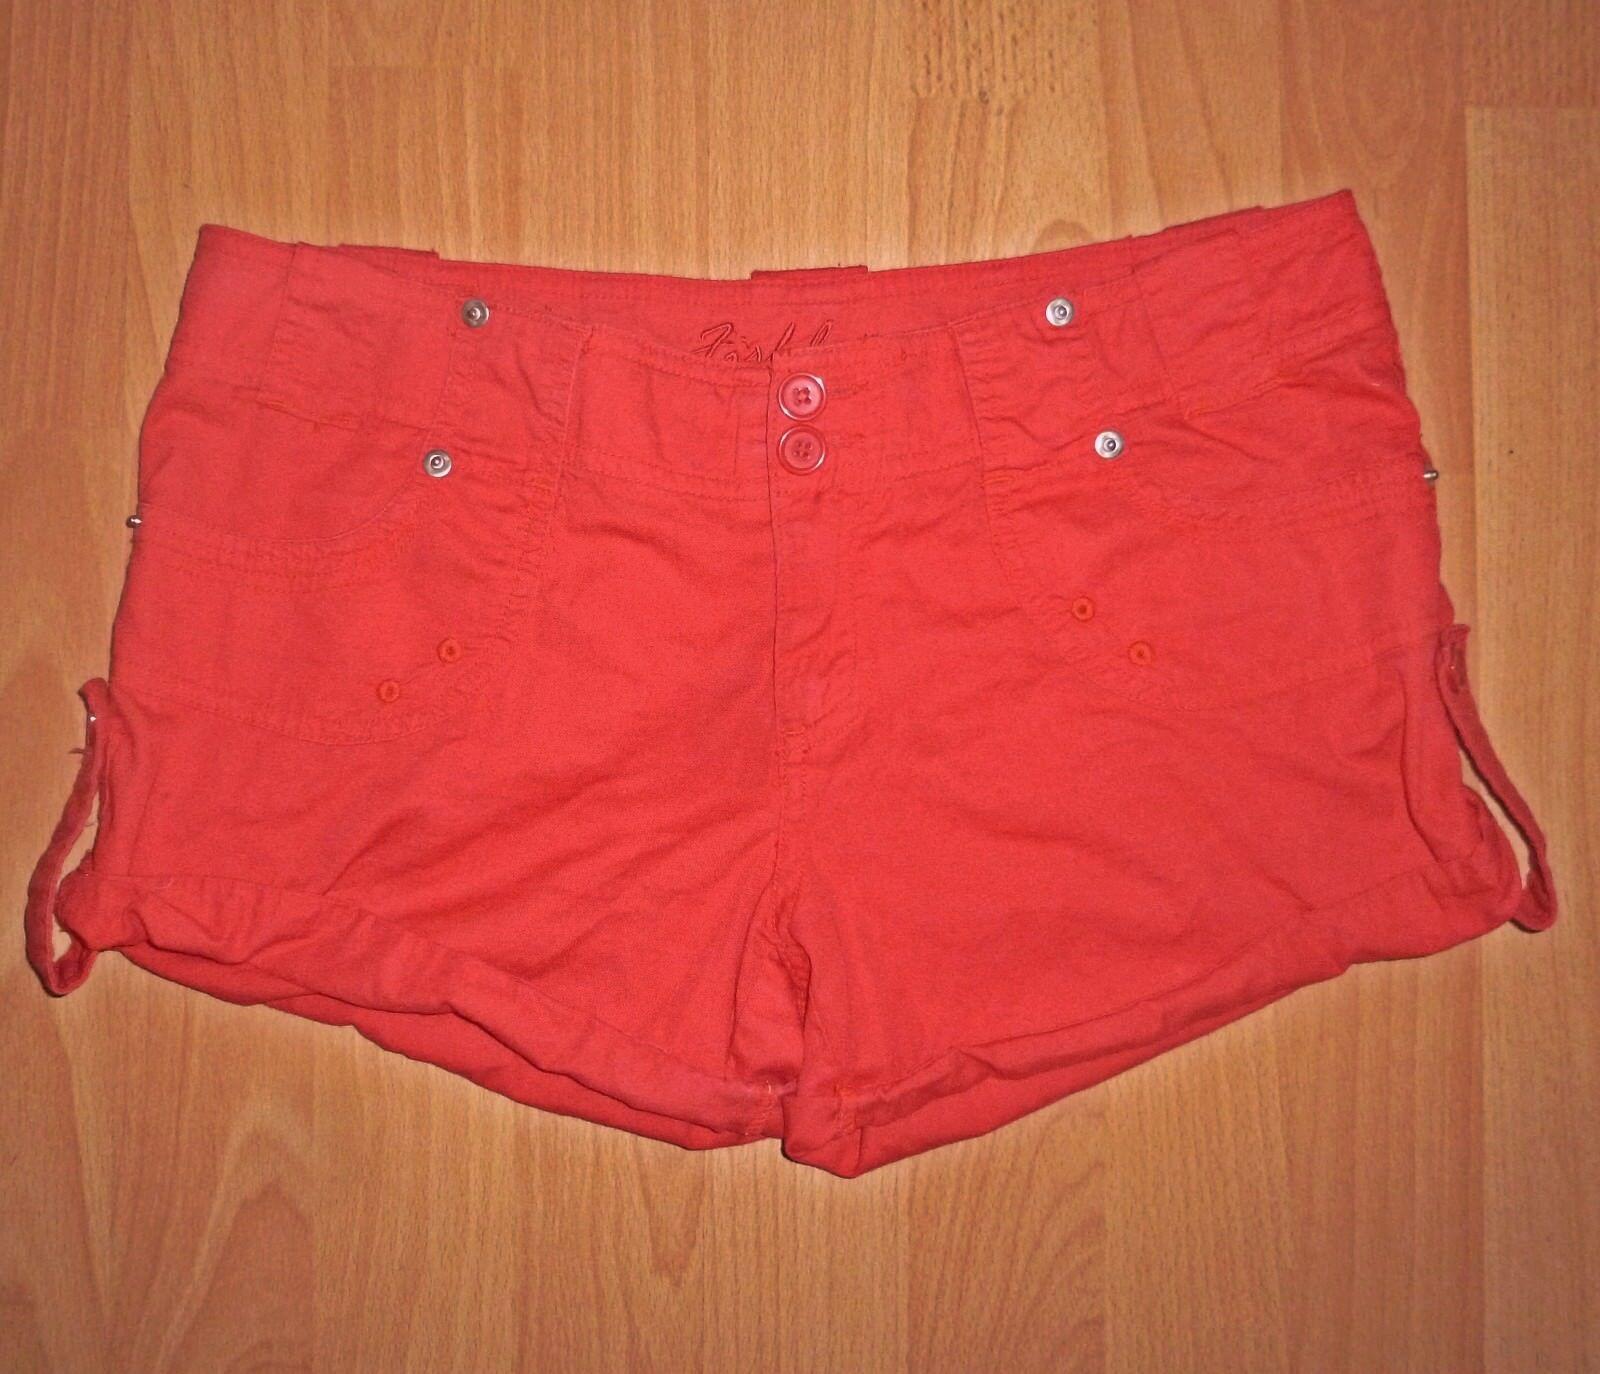 rote Fishbone Jeans Hotpants, Short, kurze Hose  Größe S, Damen